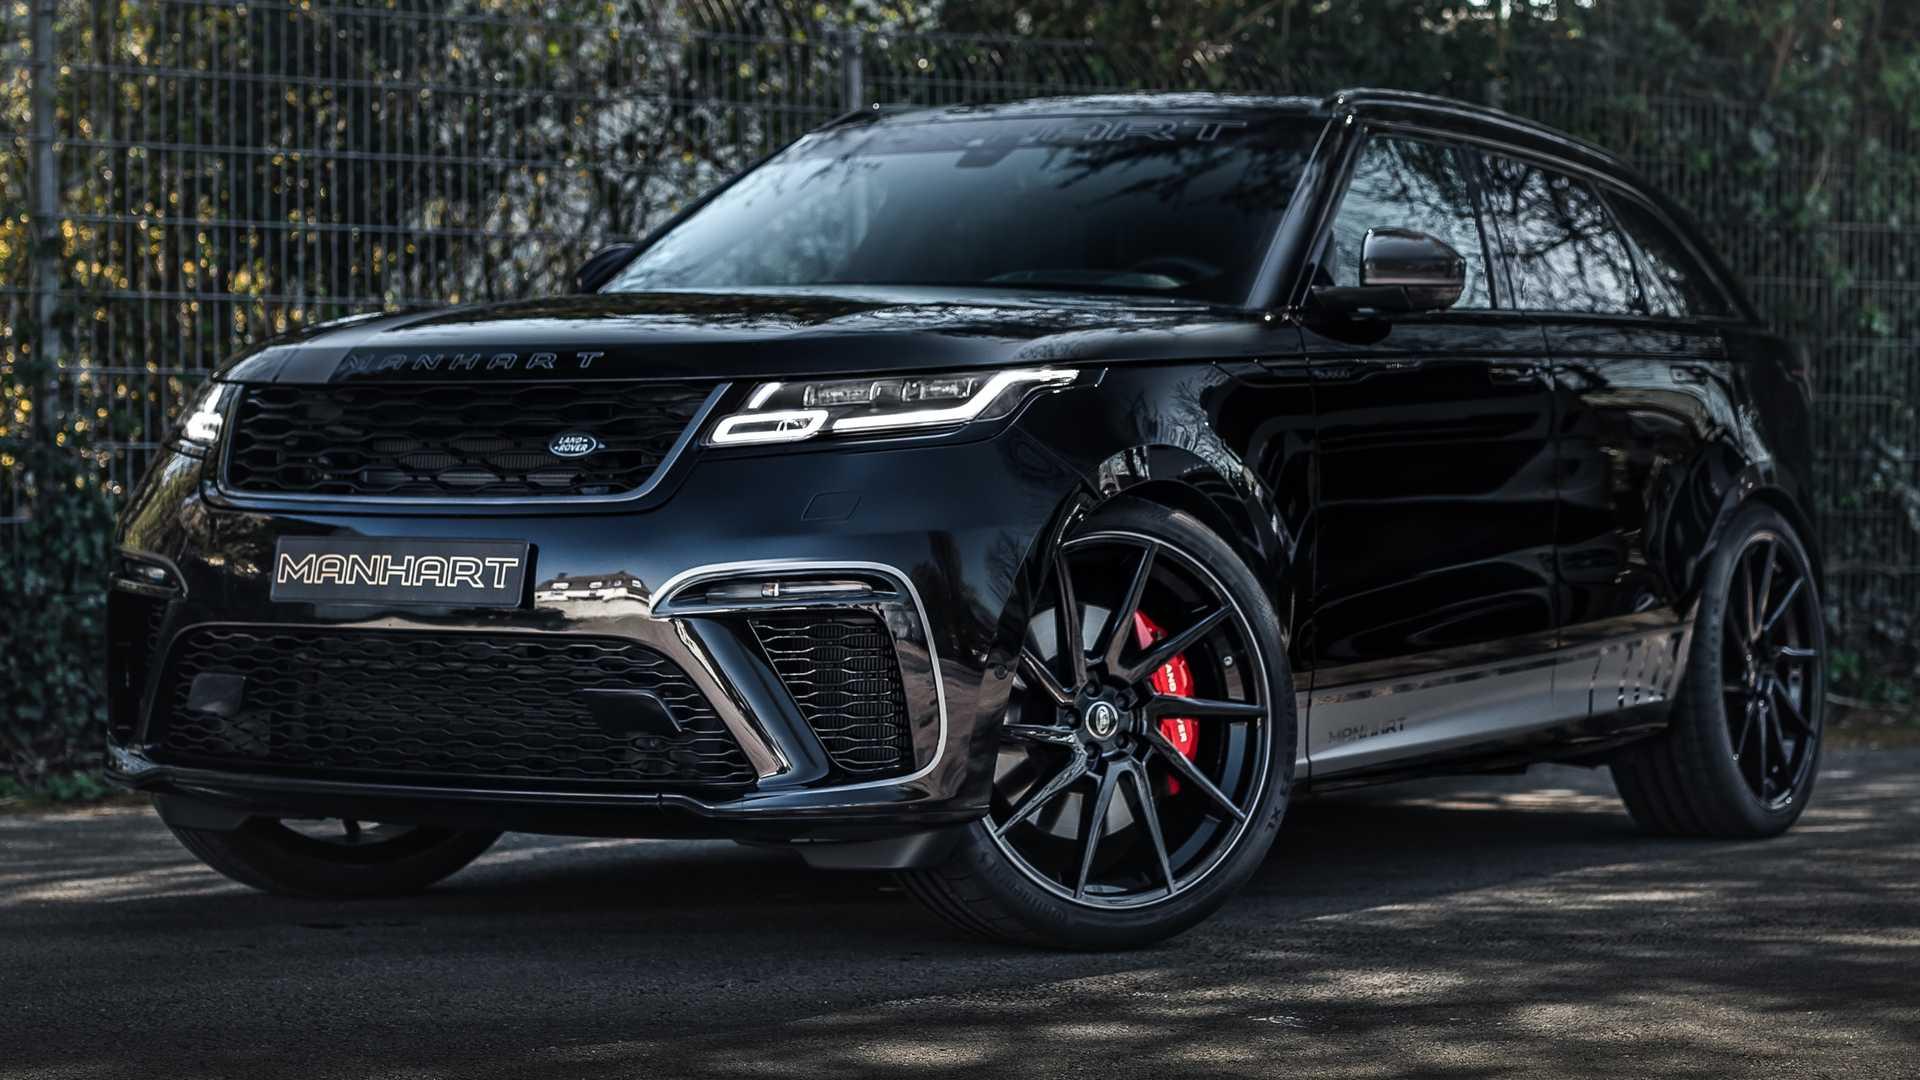 Range Rover Velar Manhart (tuning 2020)